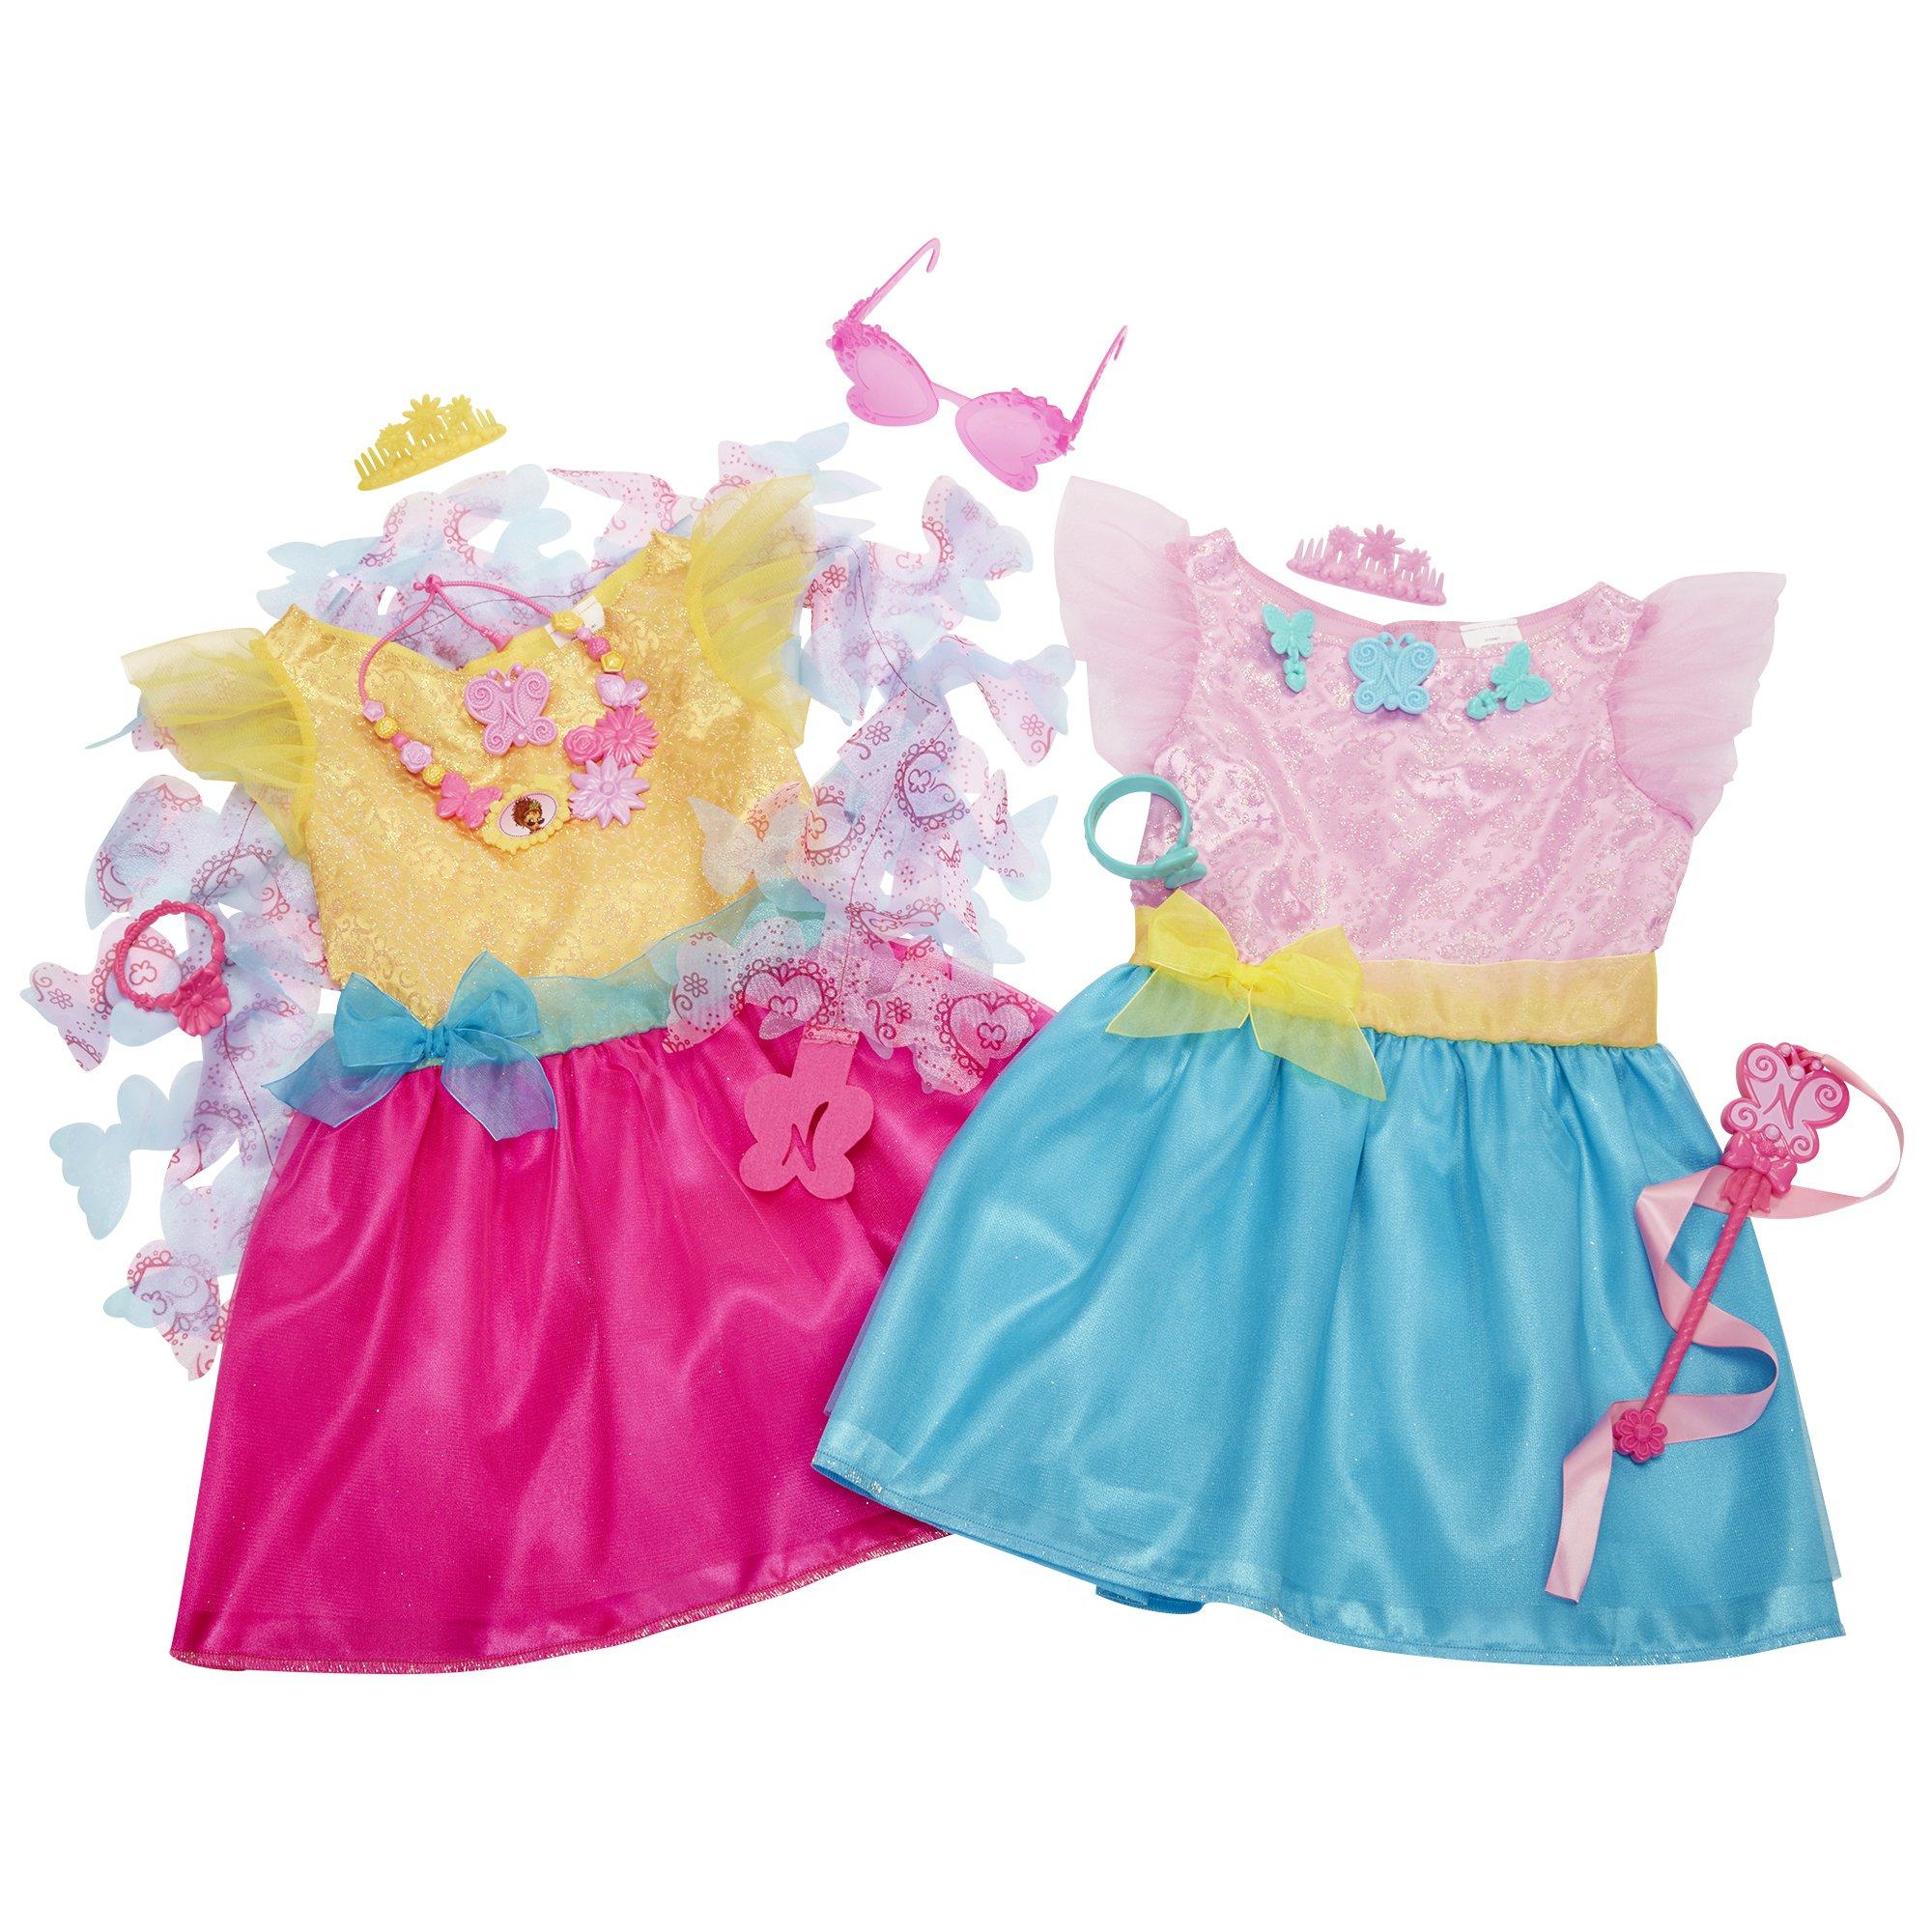 Fancy Nancy Ultimate Dress-Up Trunk, 13-Pieces, Fits Sizes 4-6X [Amazon Exclusive] by Fancy Nancy (Image #8)